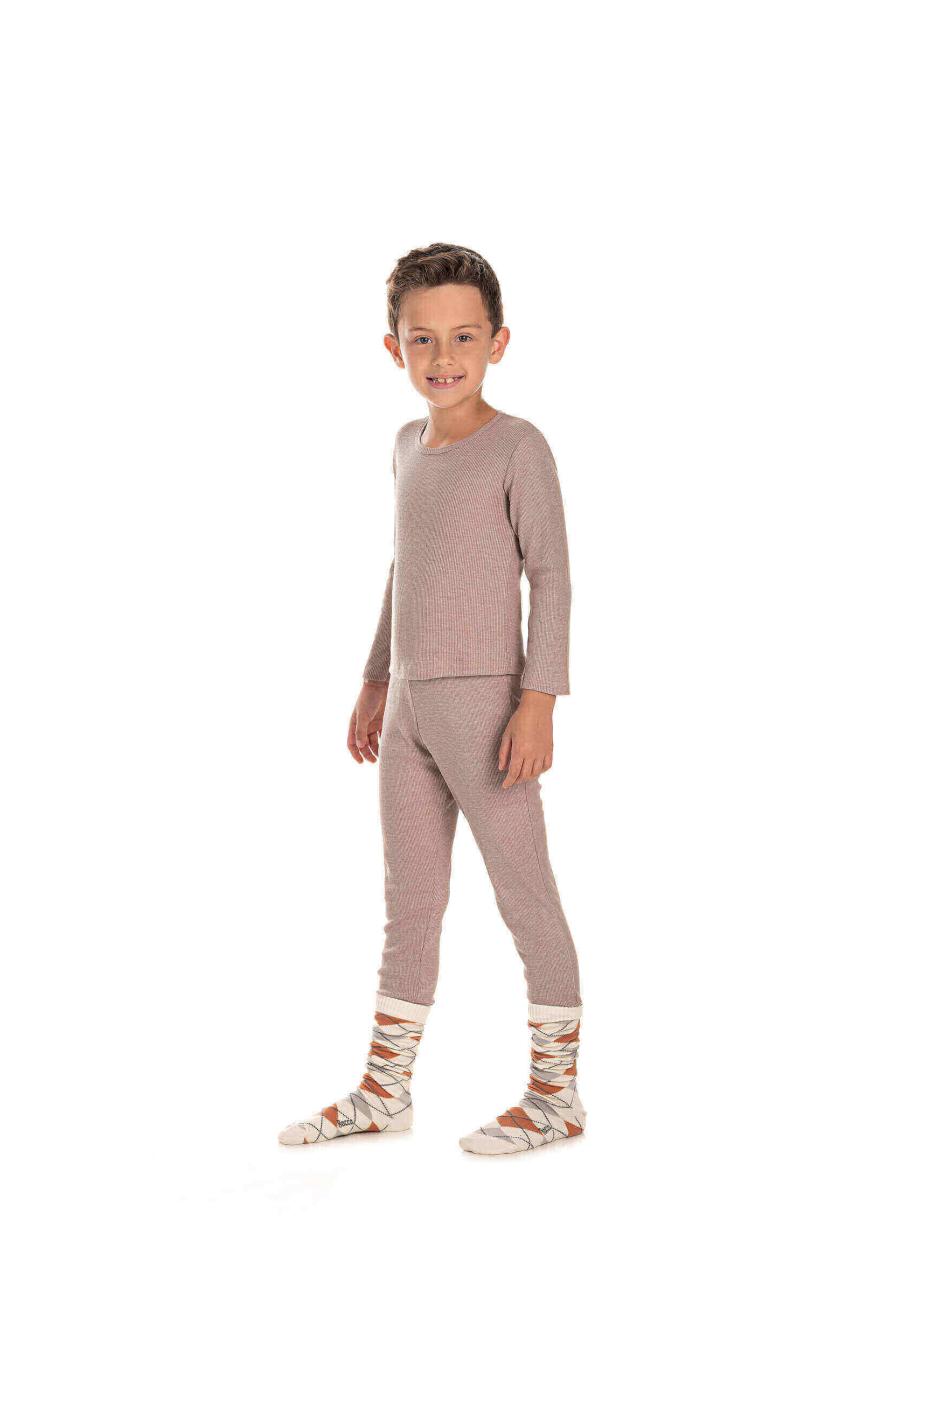 043/B - Calça Infantil Unissex Underwear